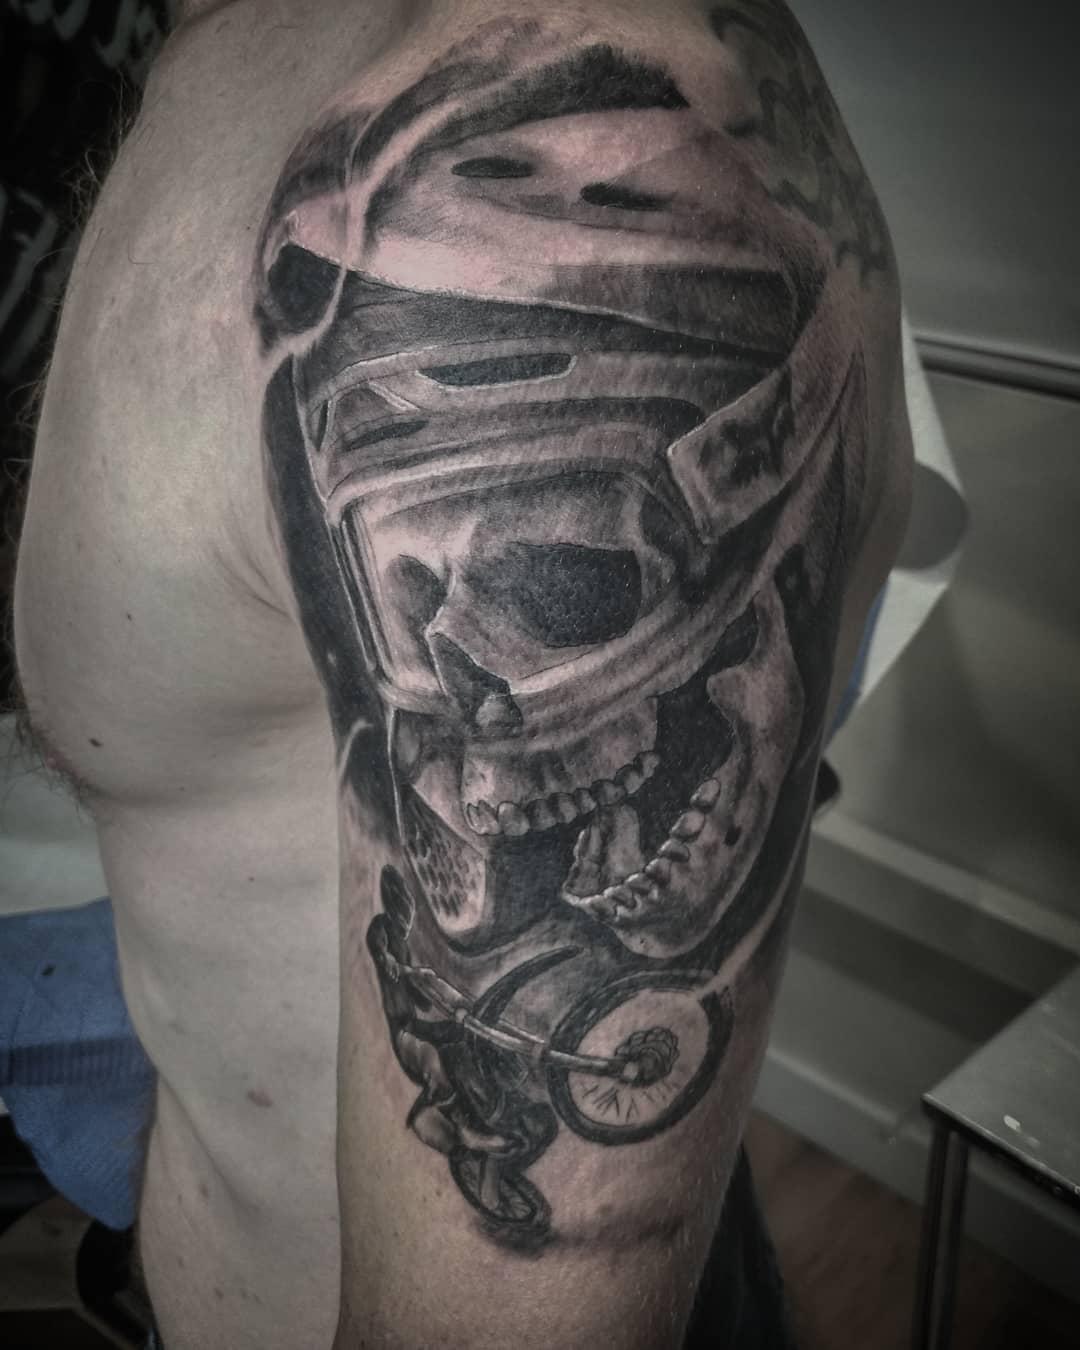 tatuajes palencia tatuadores en palencia moto kawasaki tattoo calavera